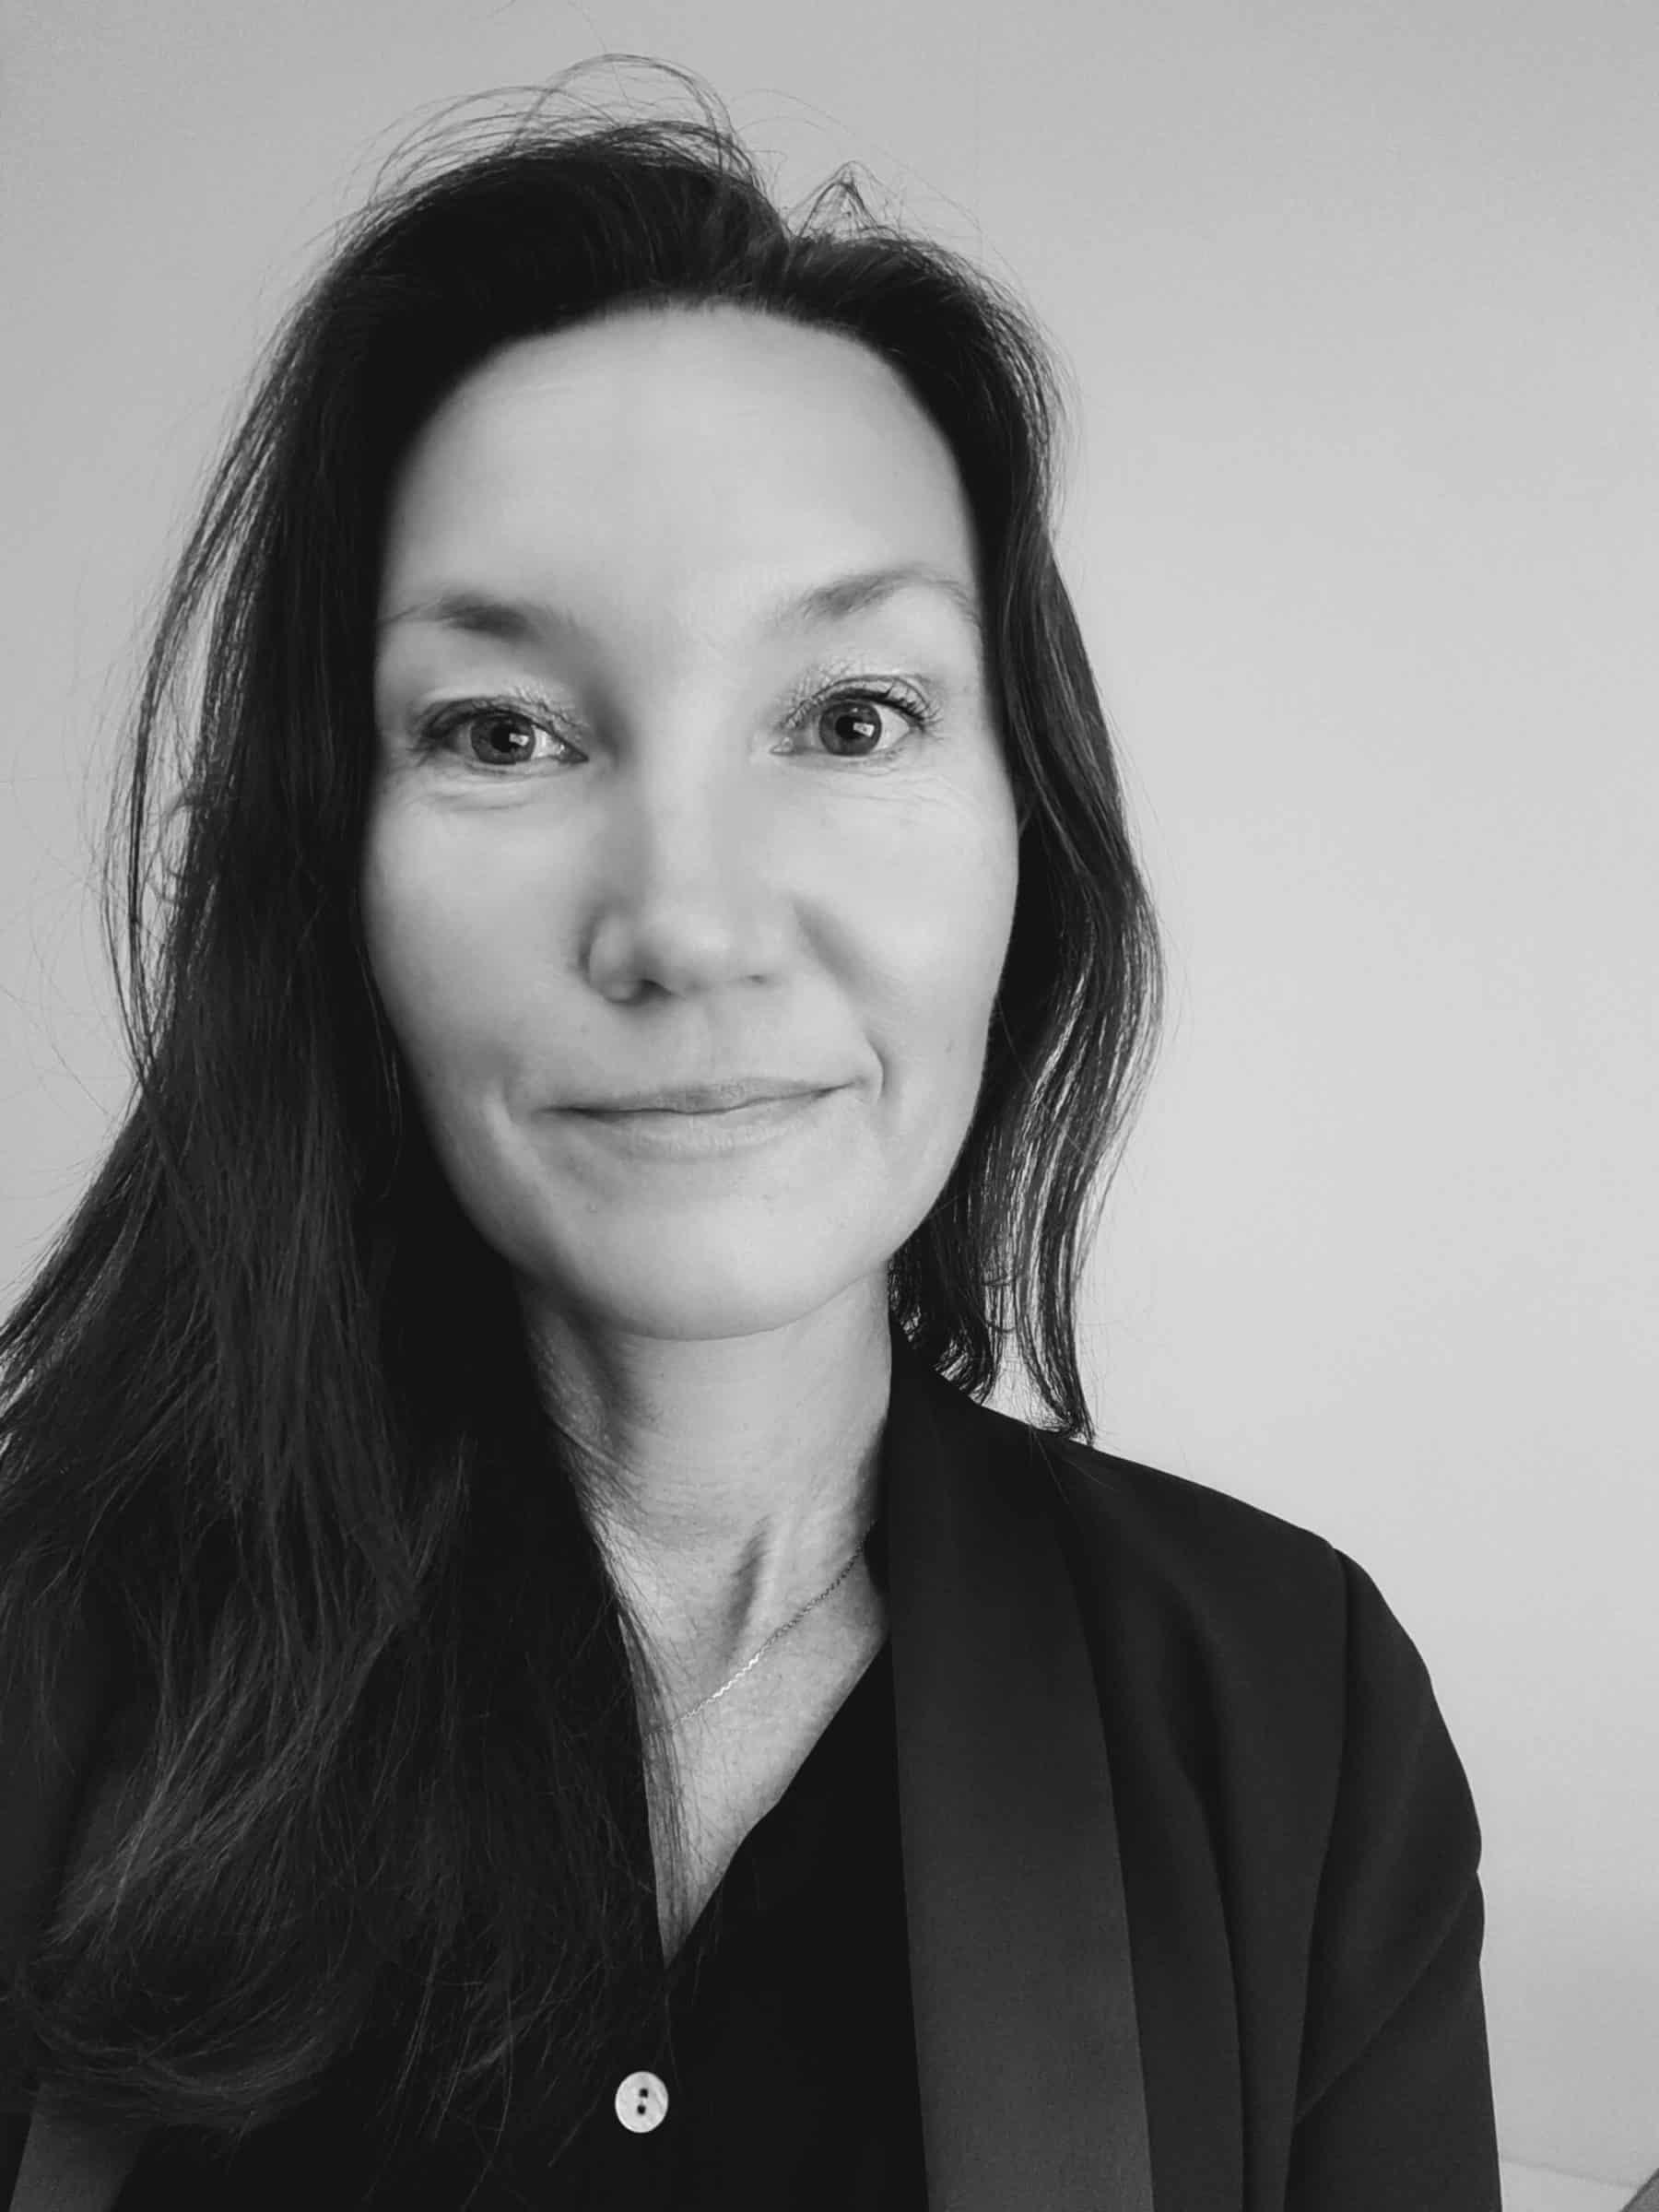 Vibeke Starup Jakobsen